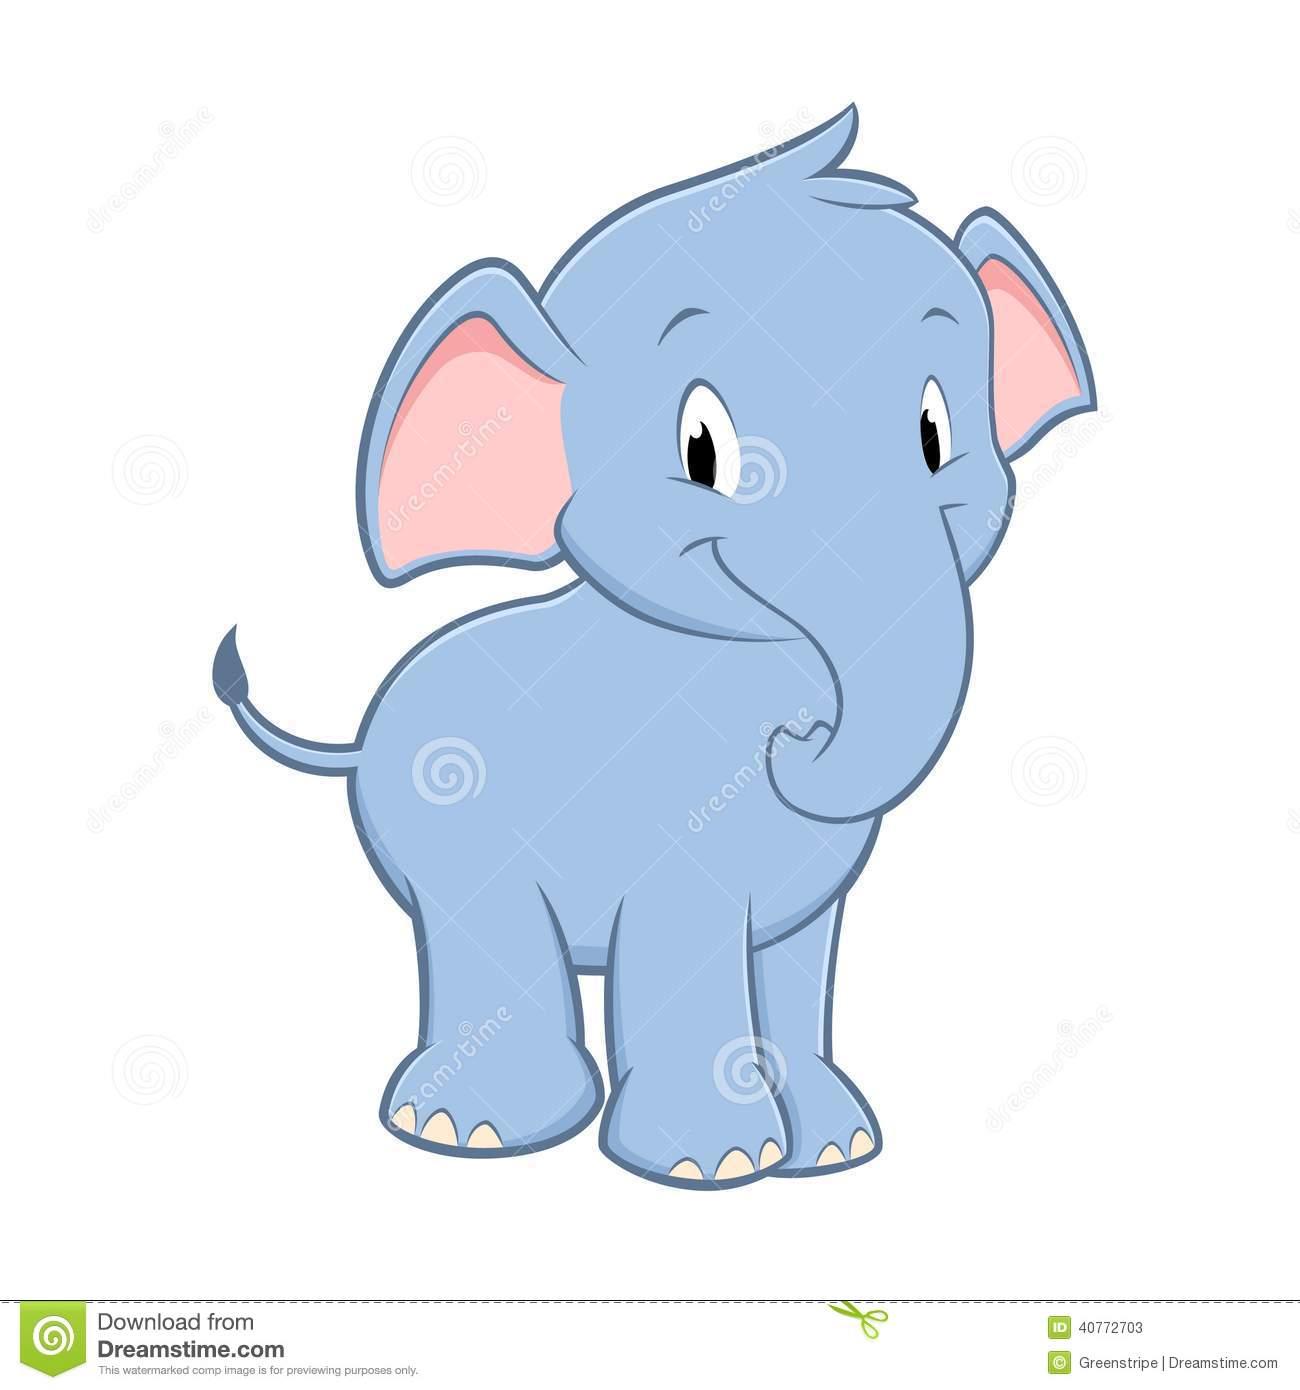 Baby Elephant Wallpaper Cartoon - WallpaperSafari